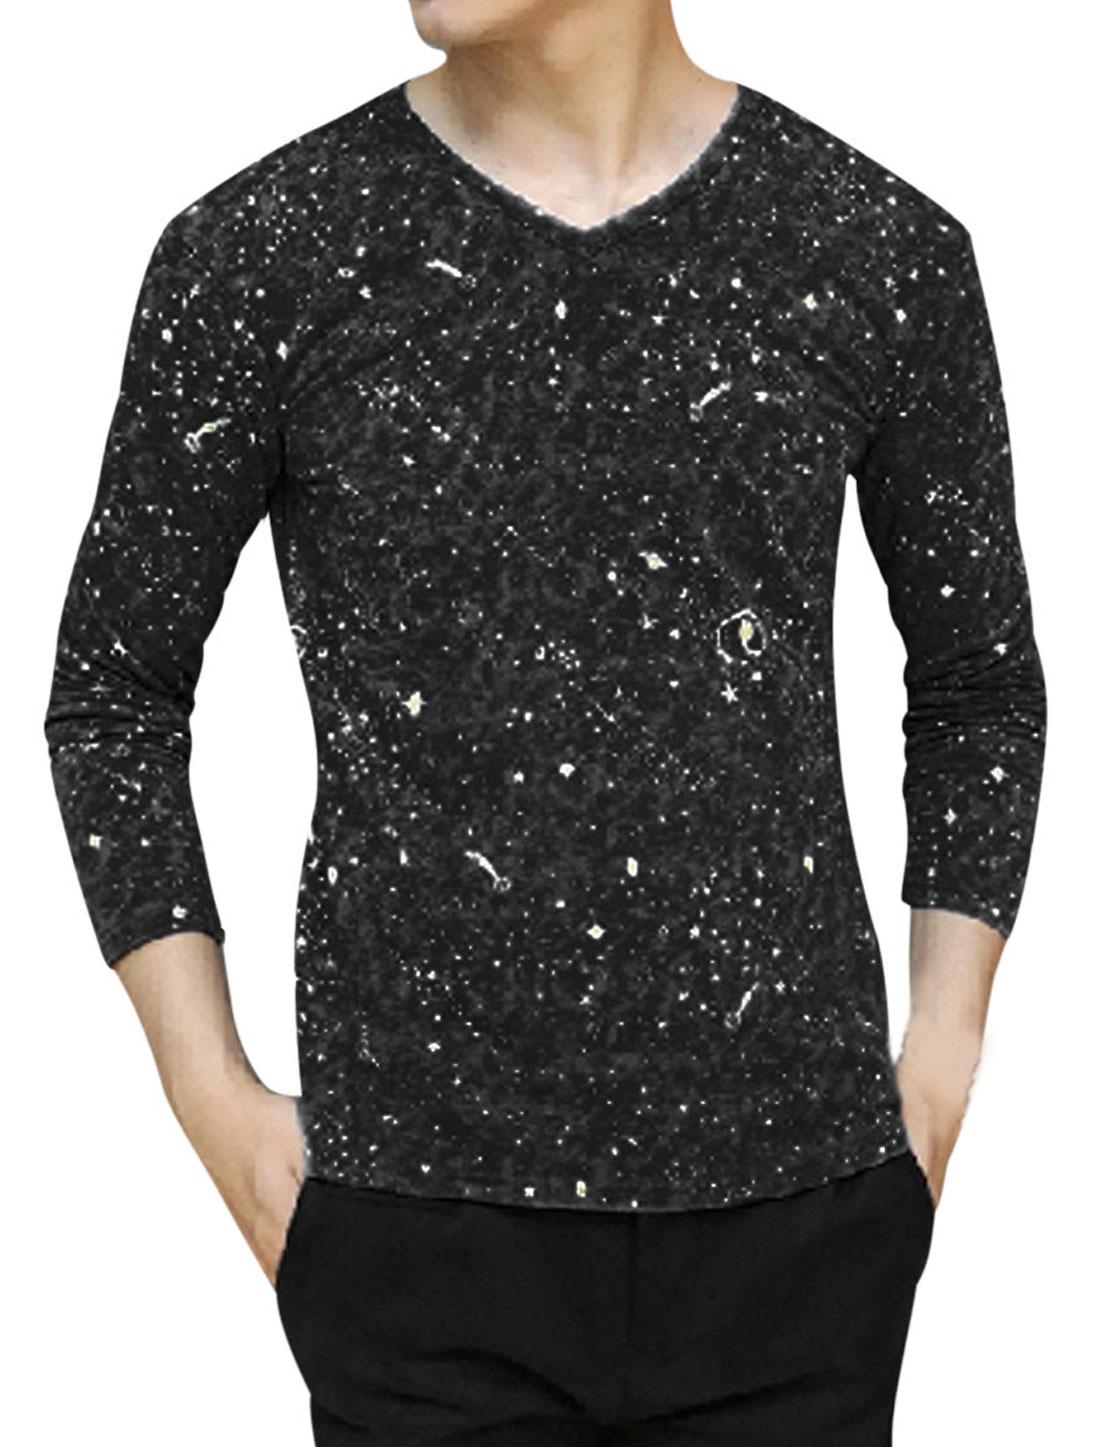 Men Starry Sky Printed V Neck Long Sleeves Leisure T-shirt Black M